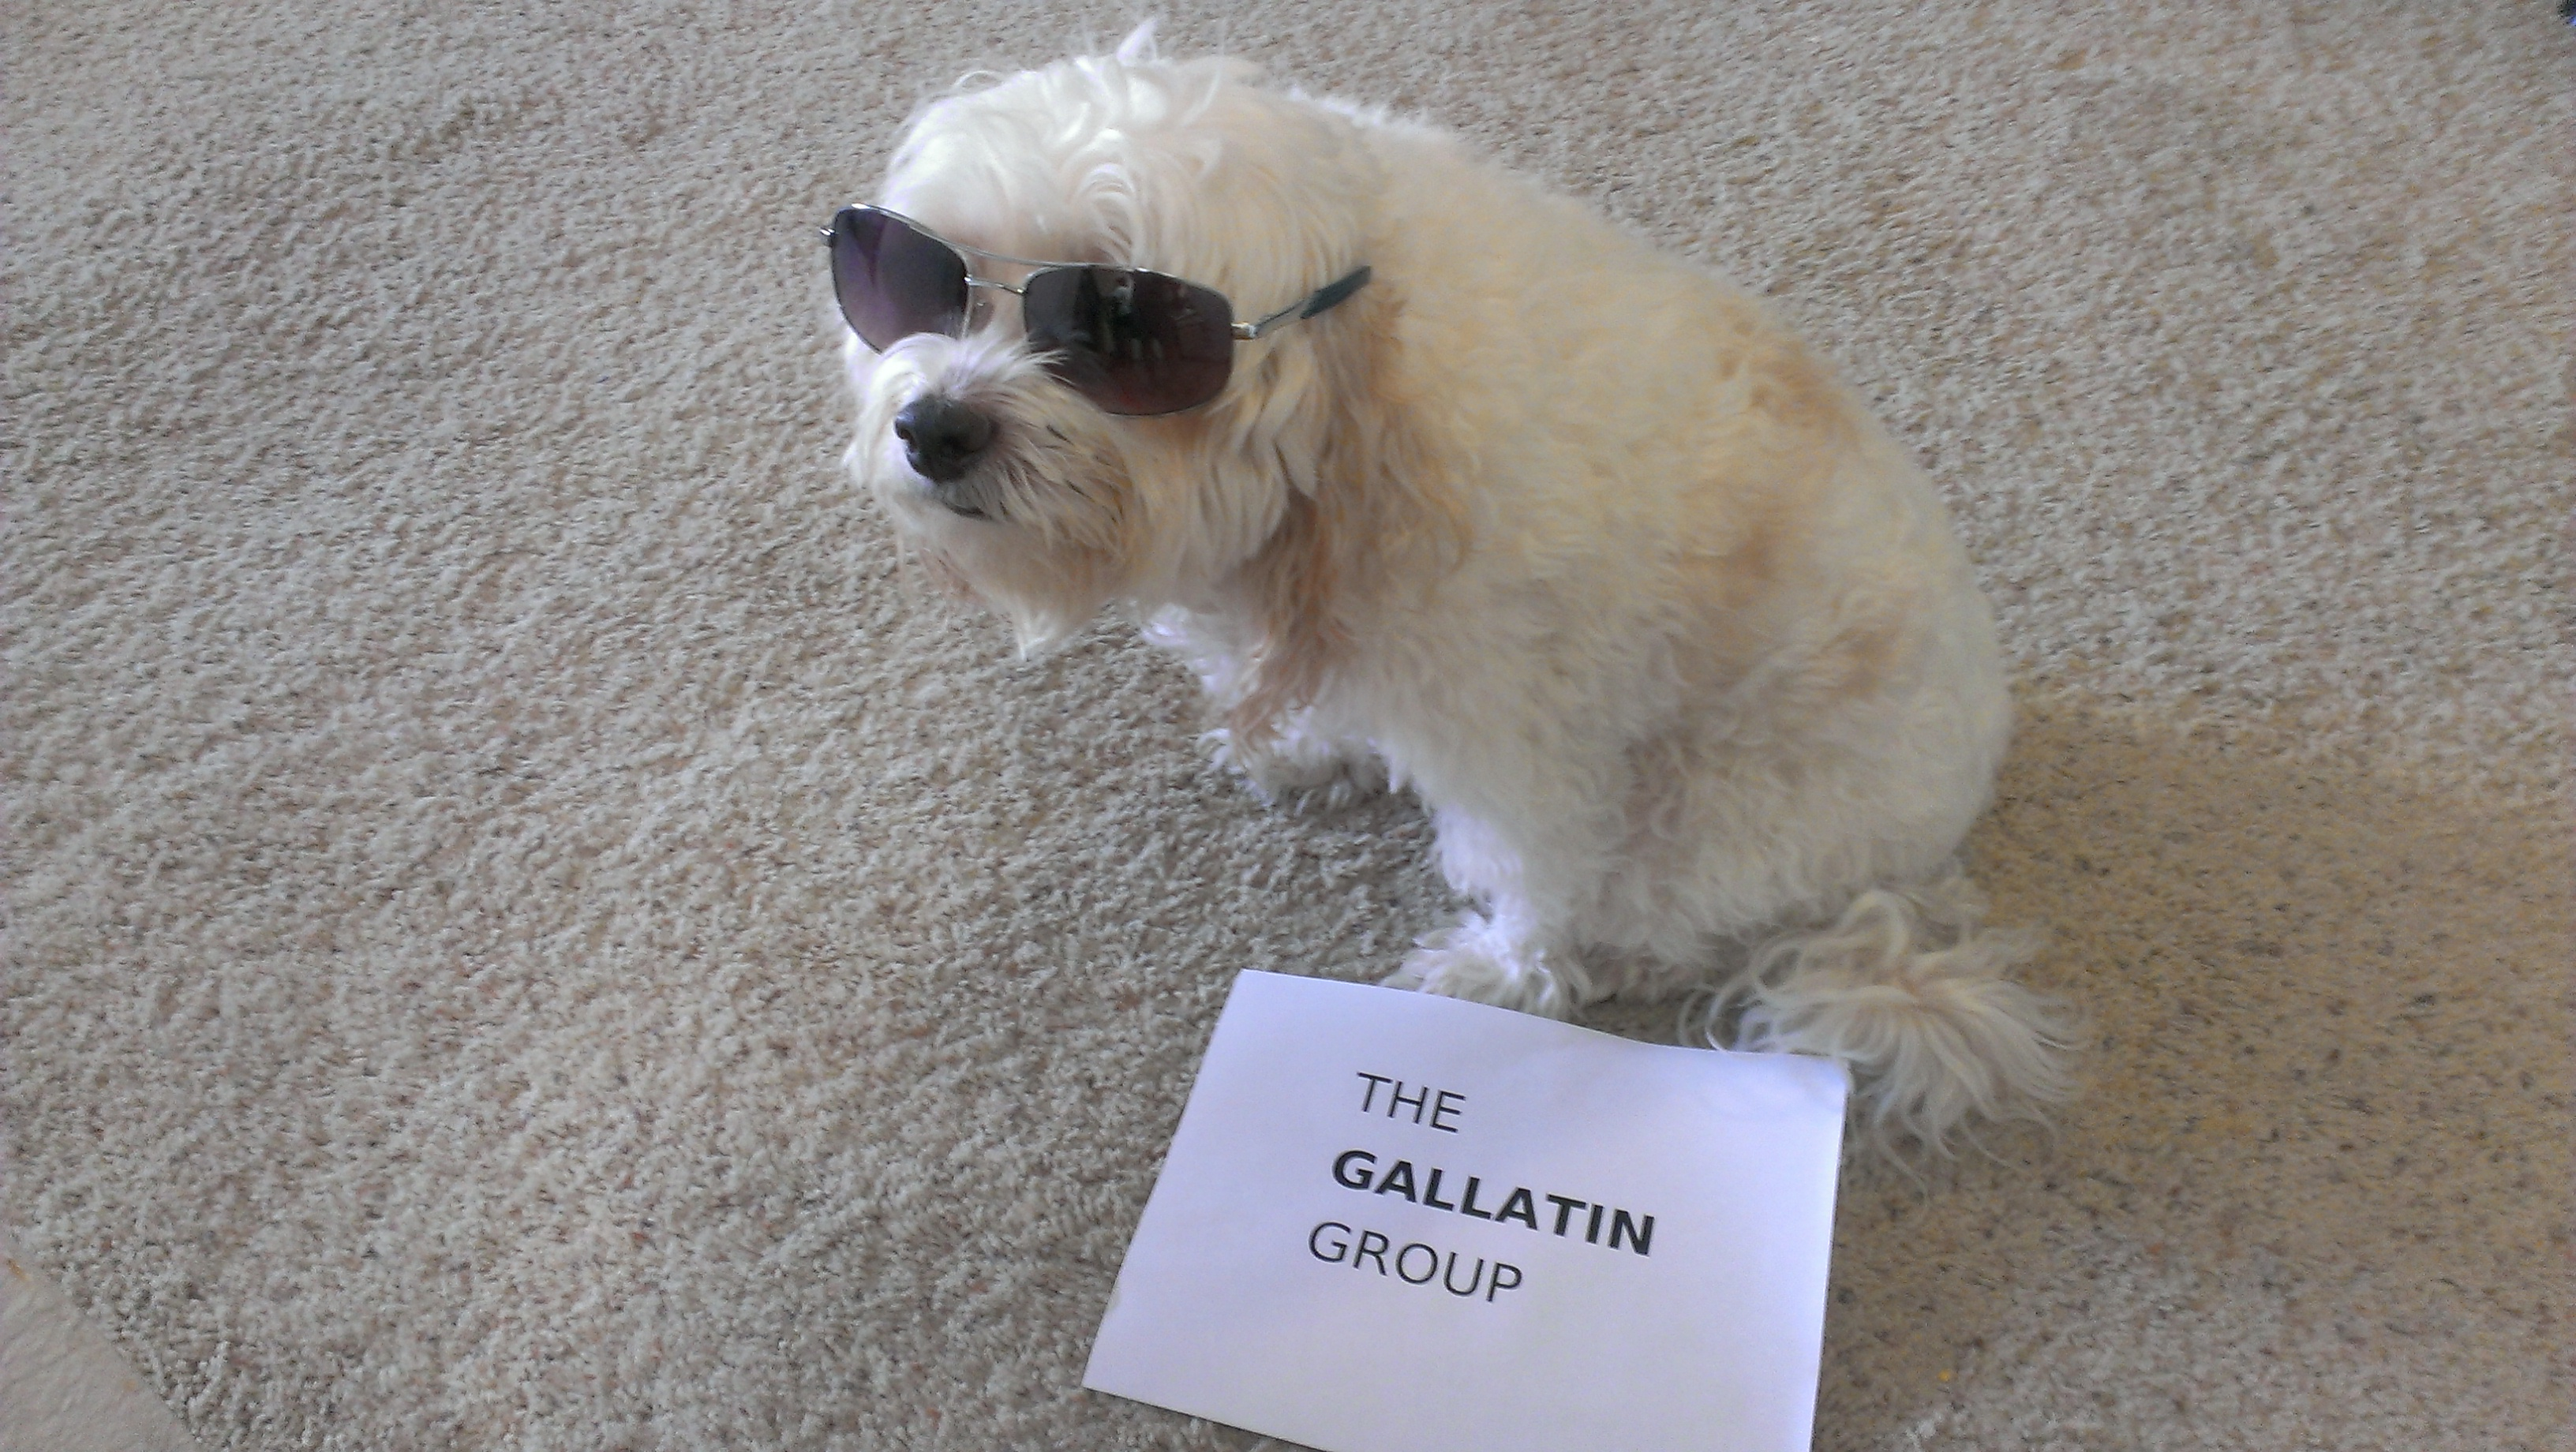 Buddy-Honorary spokesdog for The Gallatin Group